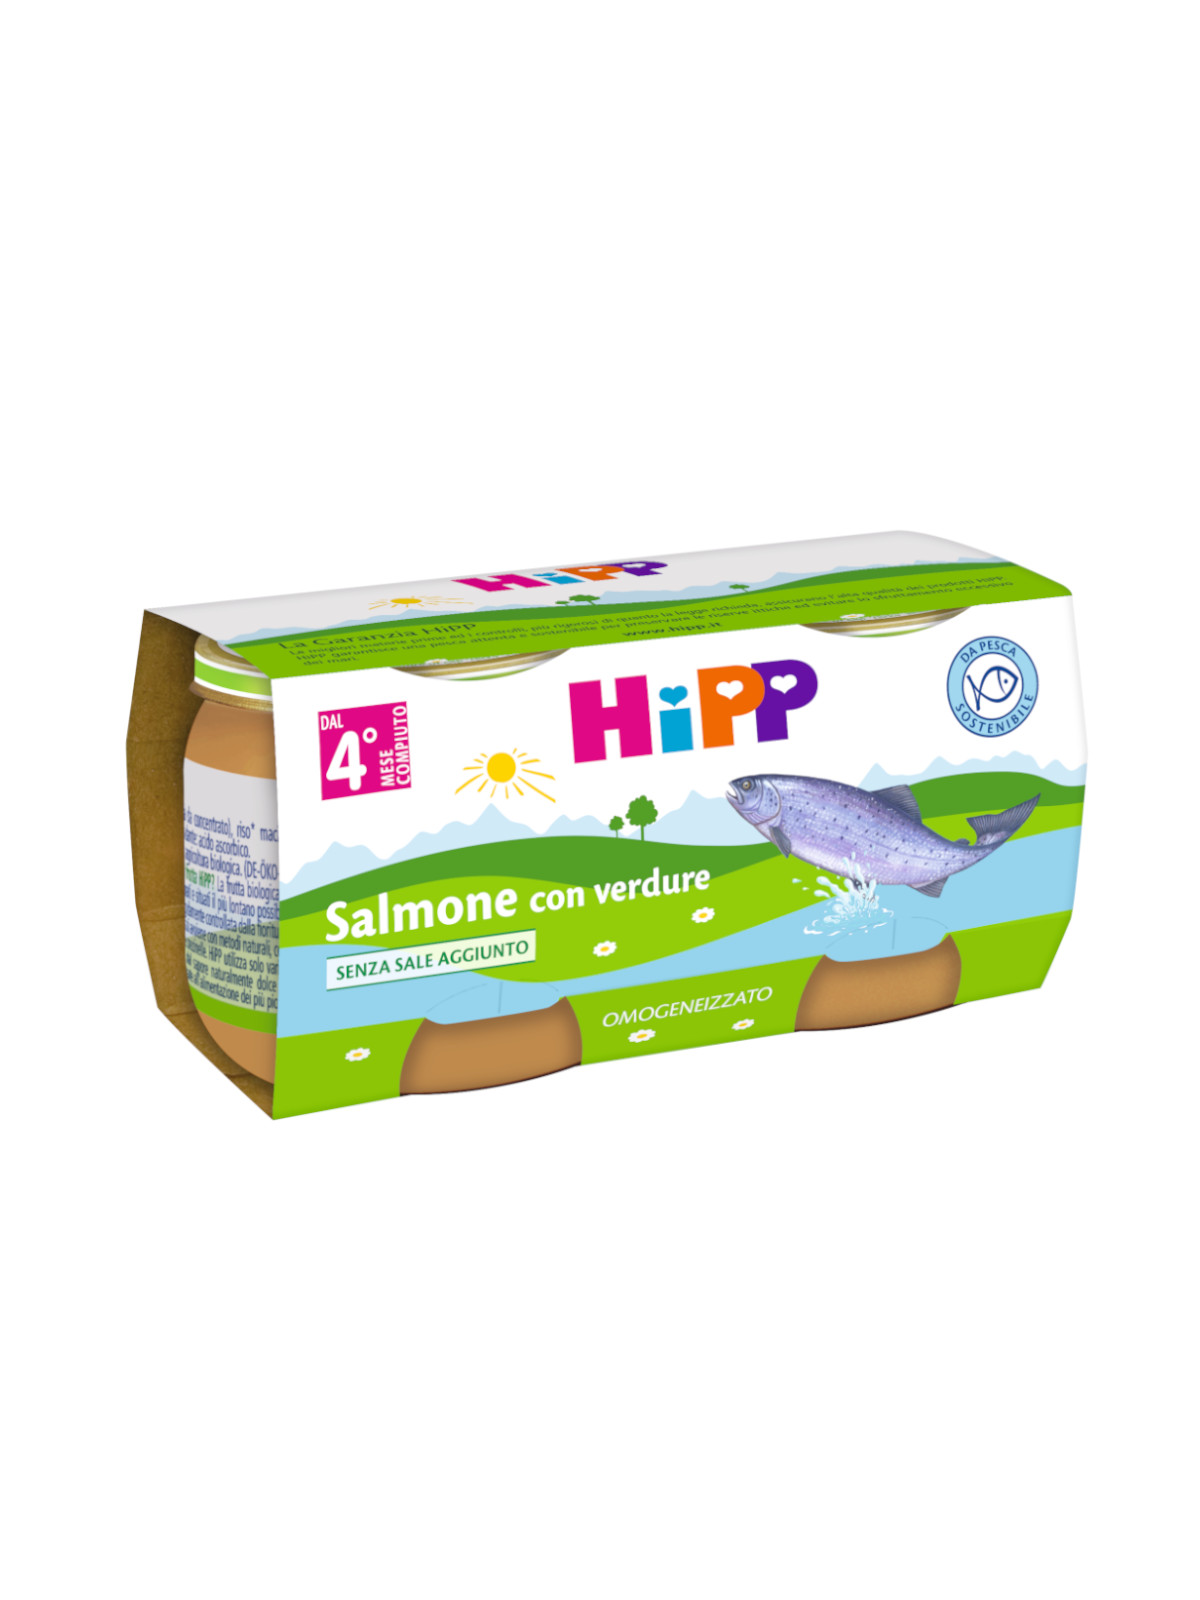 Omogeneizzato salmone con verdure 2x80g - Hipp